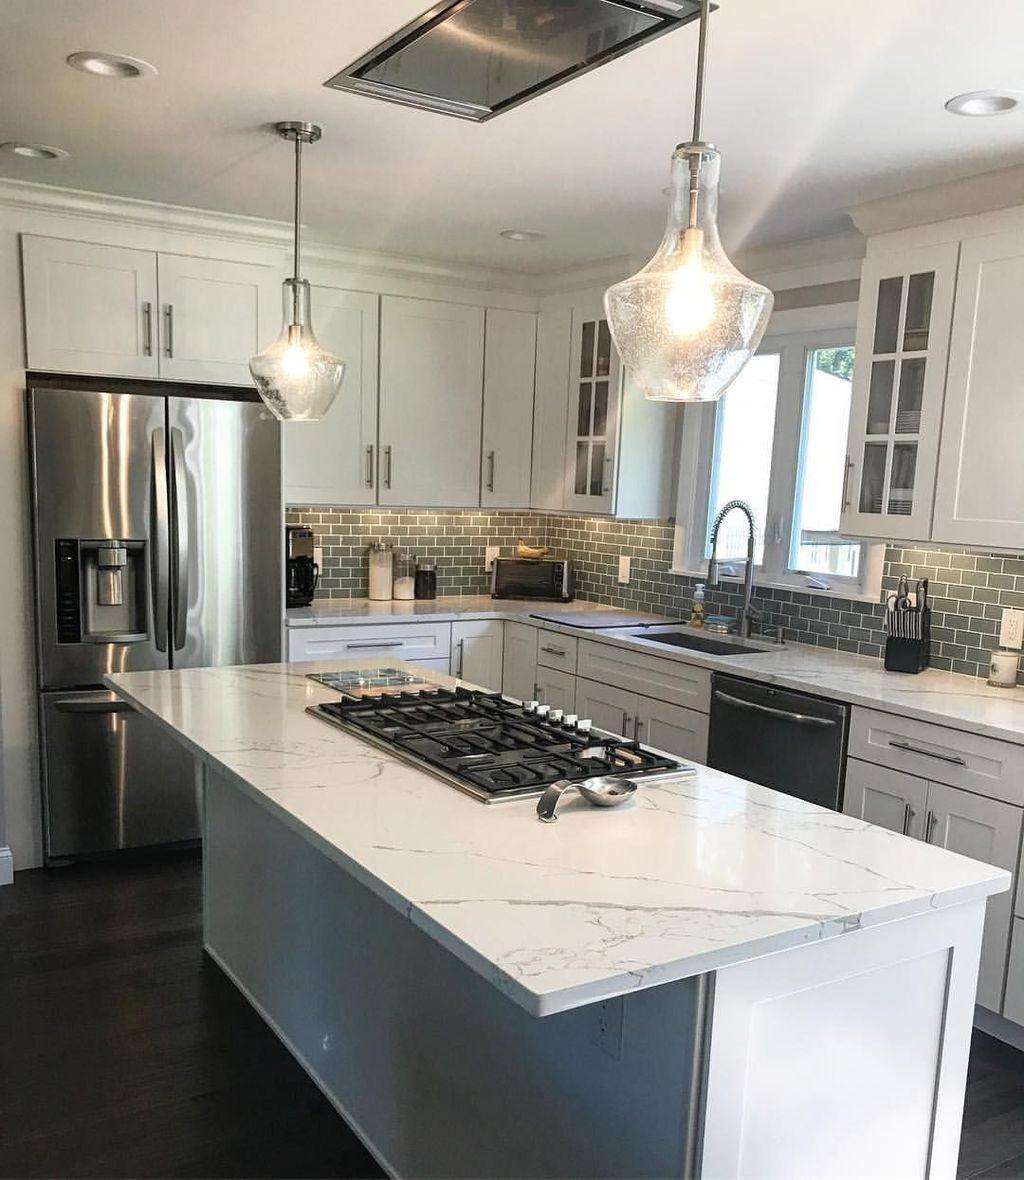 Brilliant Small Kitchen Remodel Design Ideas On A Budget 09